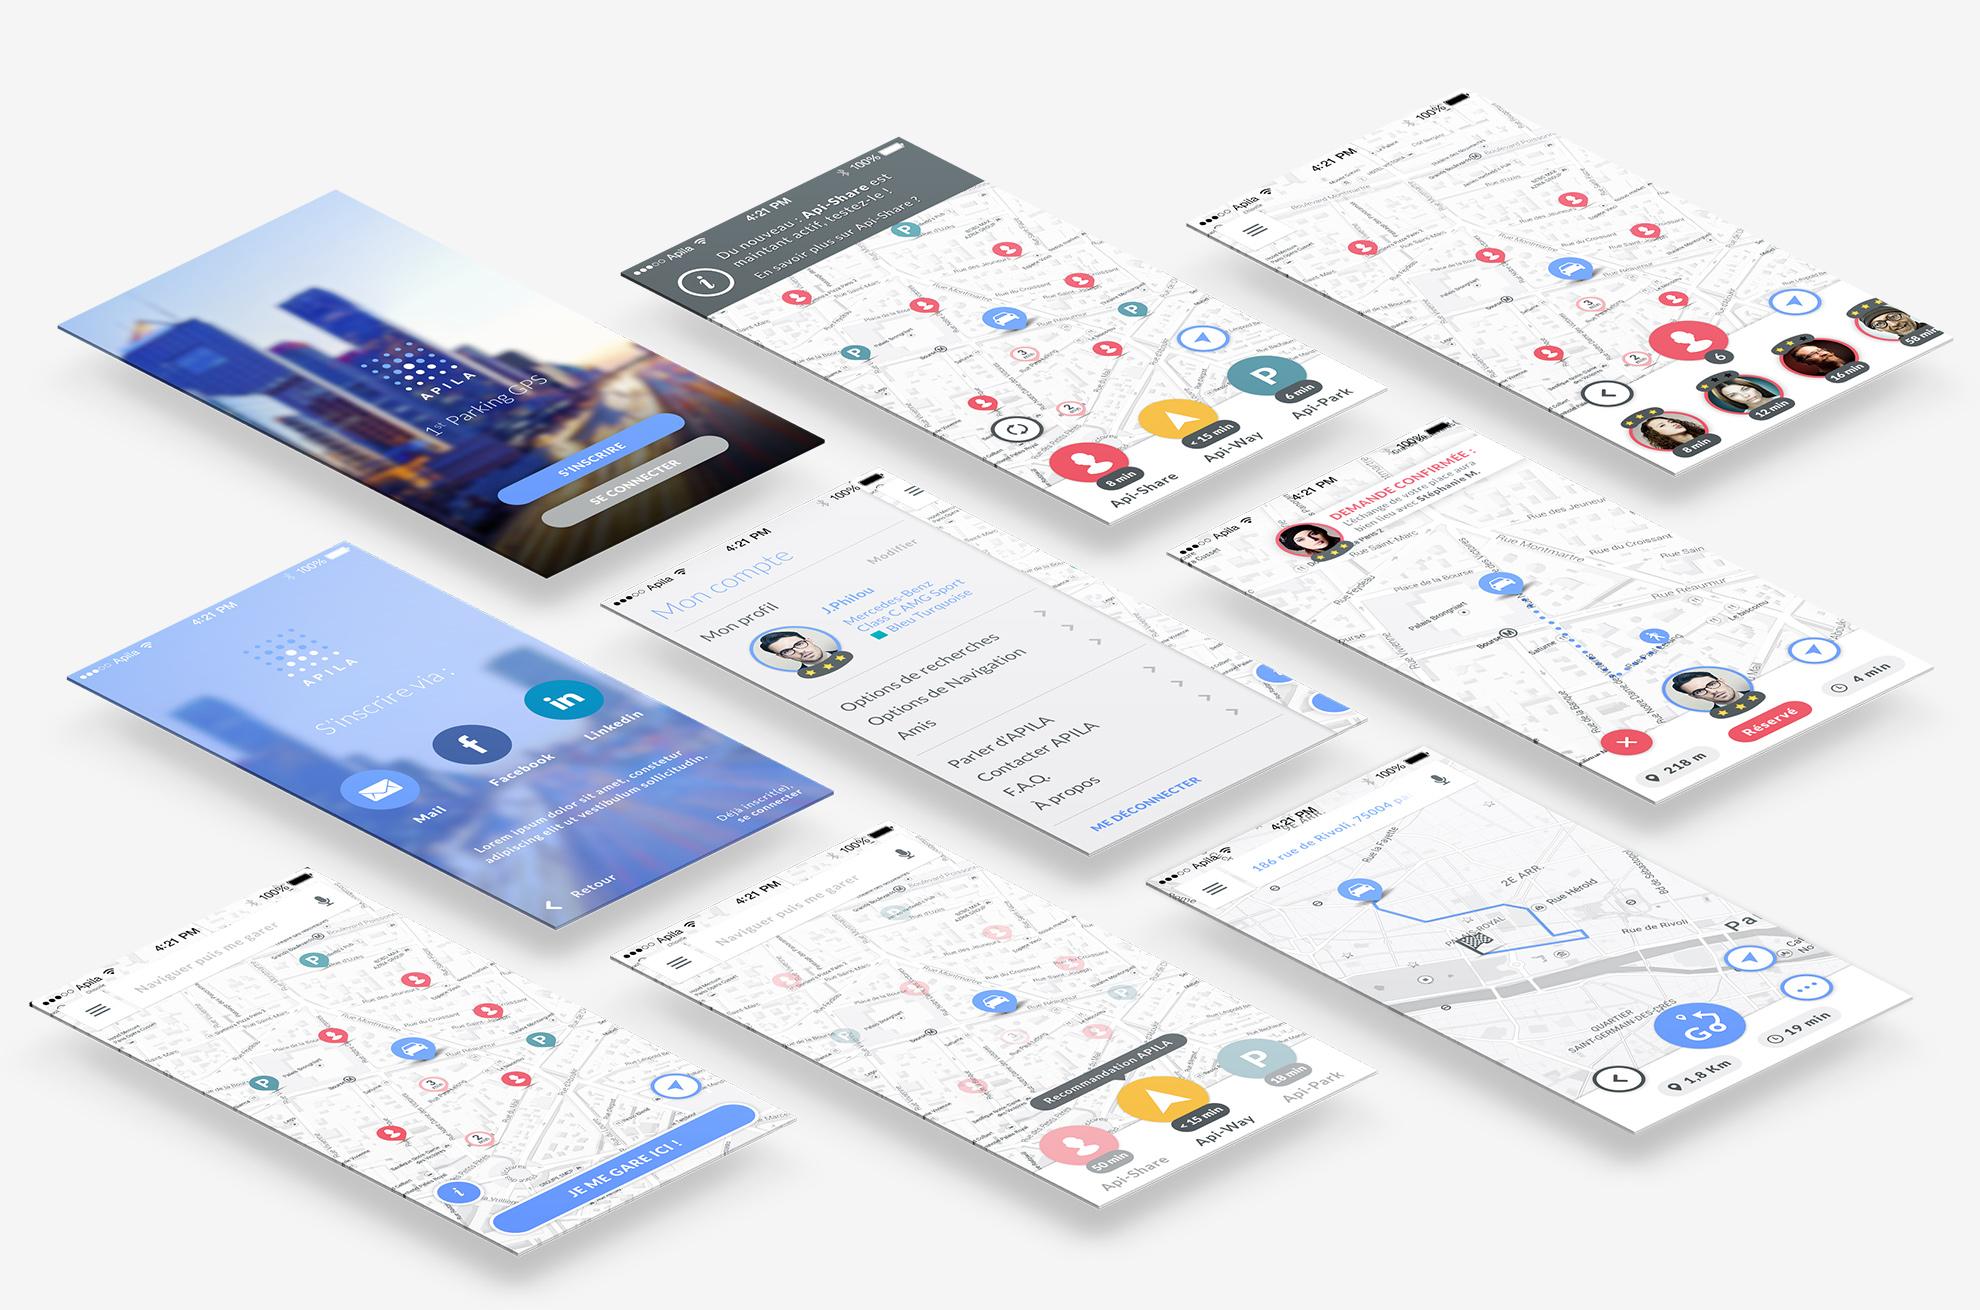 Overview of APILA main screens